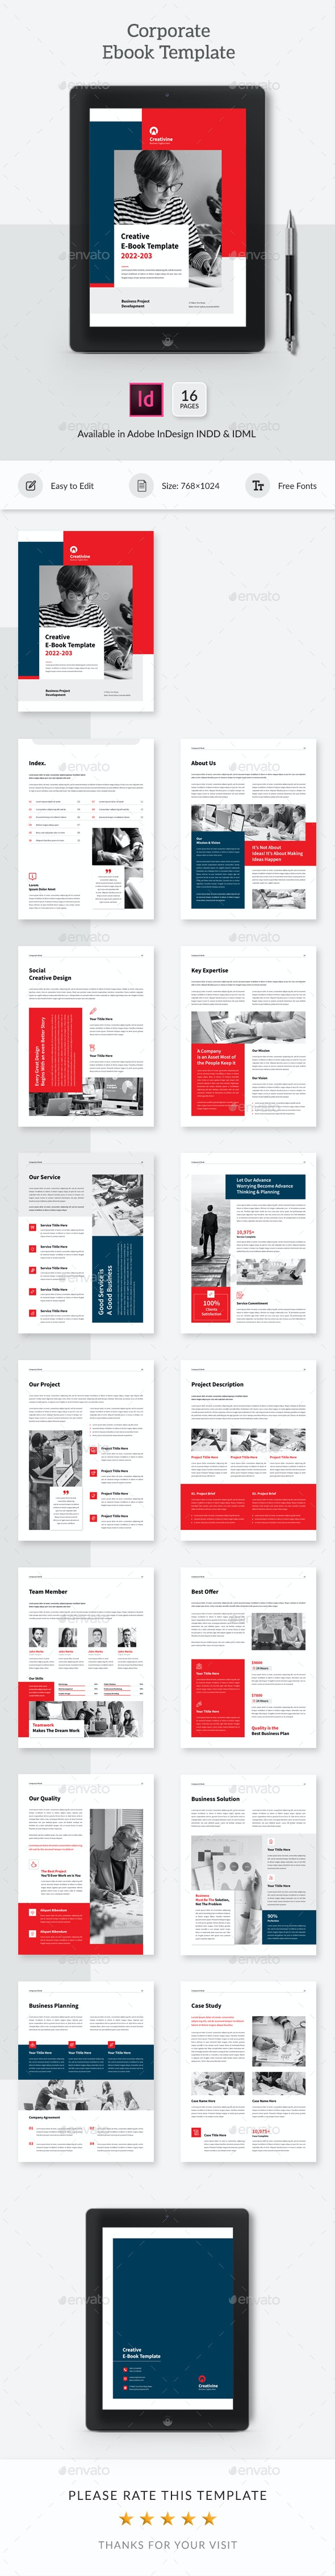 Corporate Ebook - Digital Books ePublishing